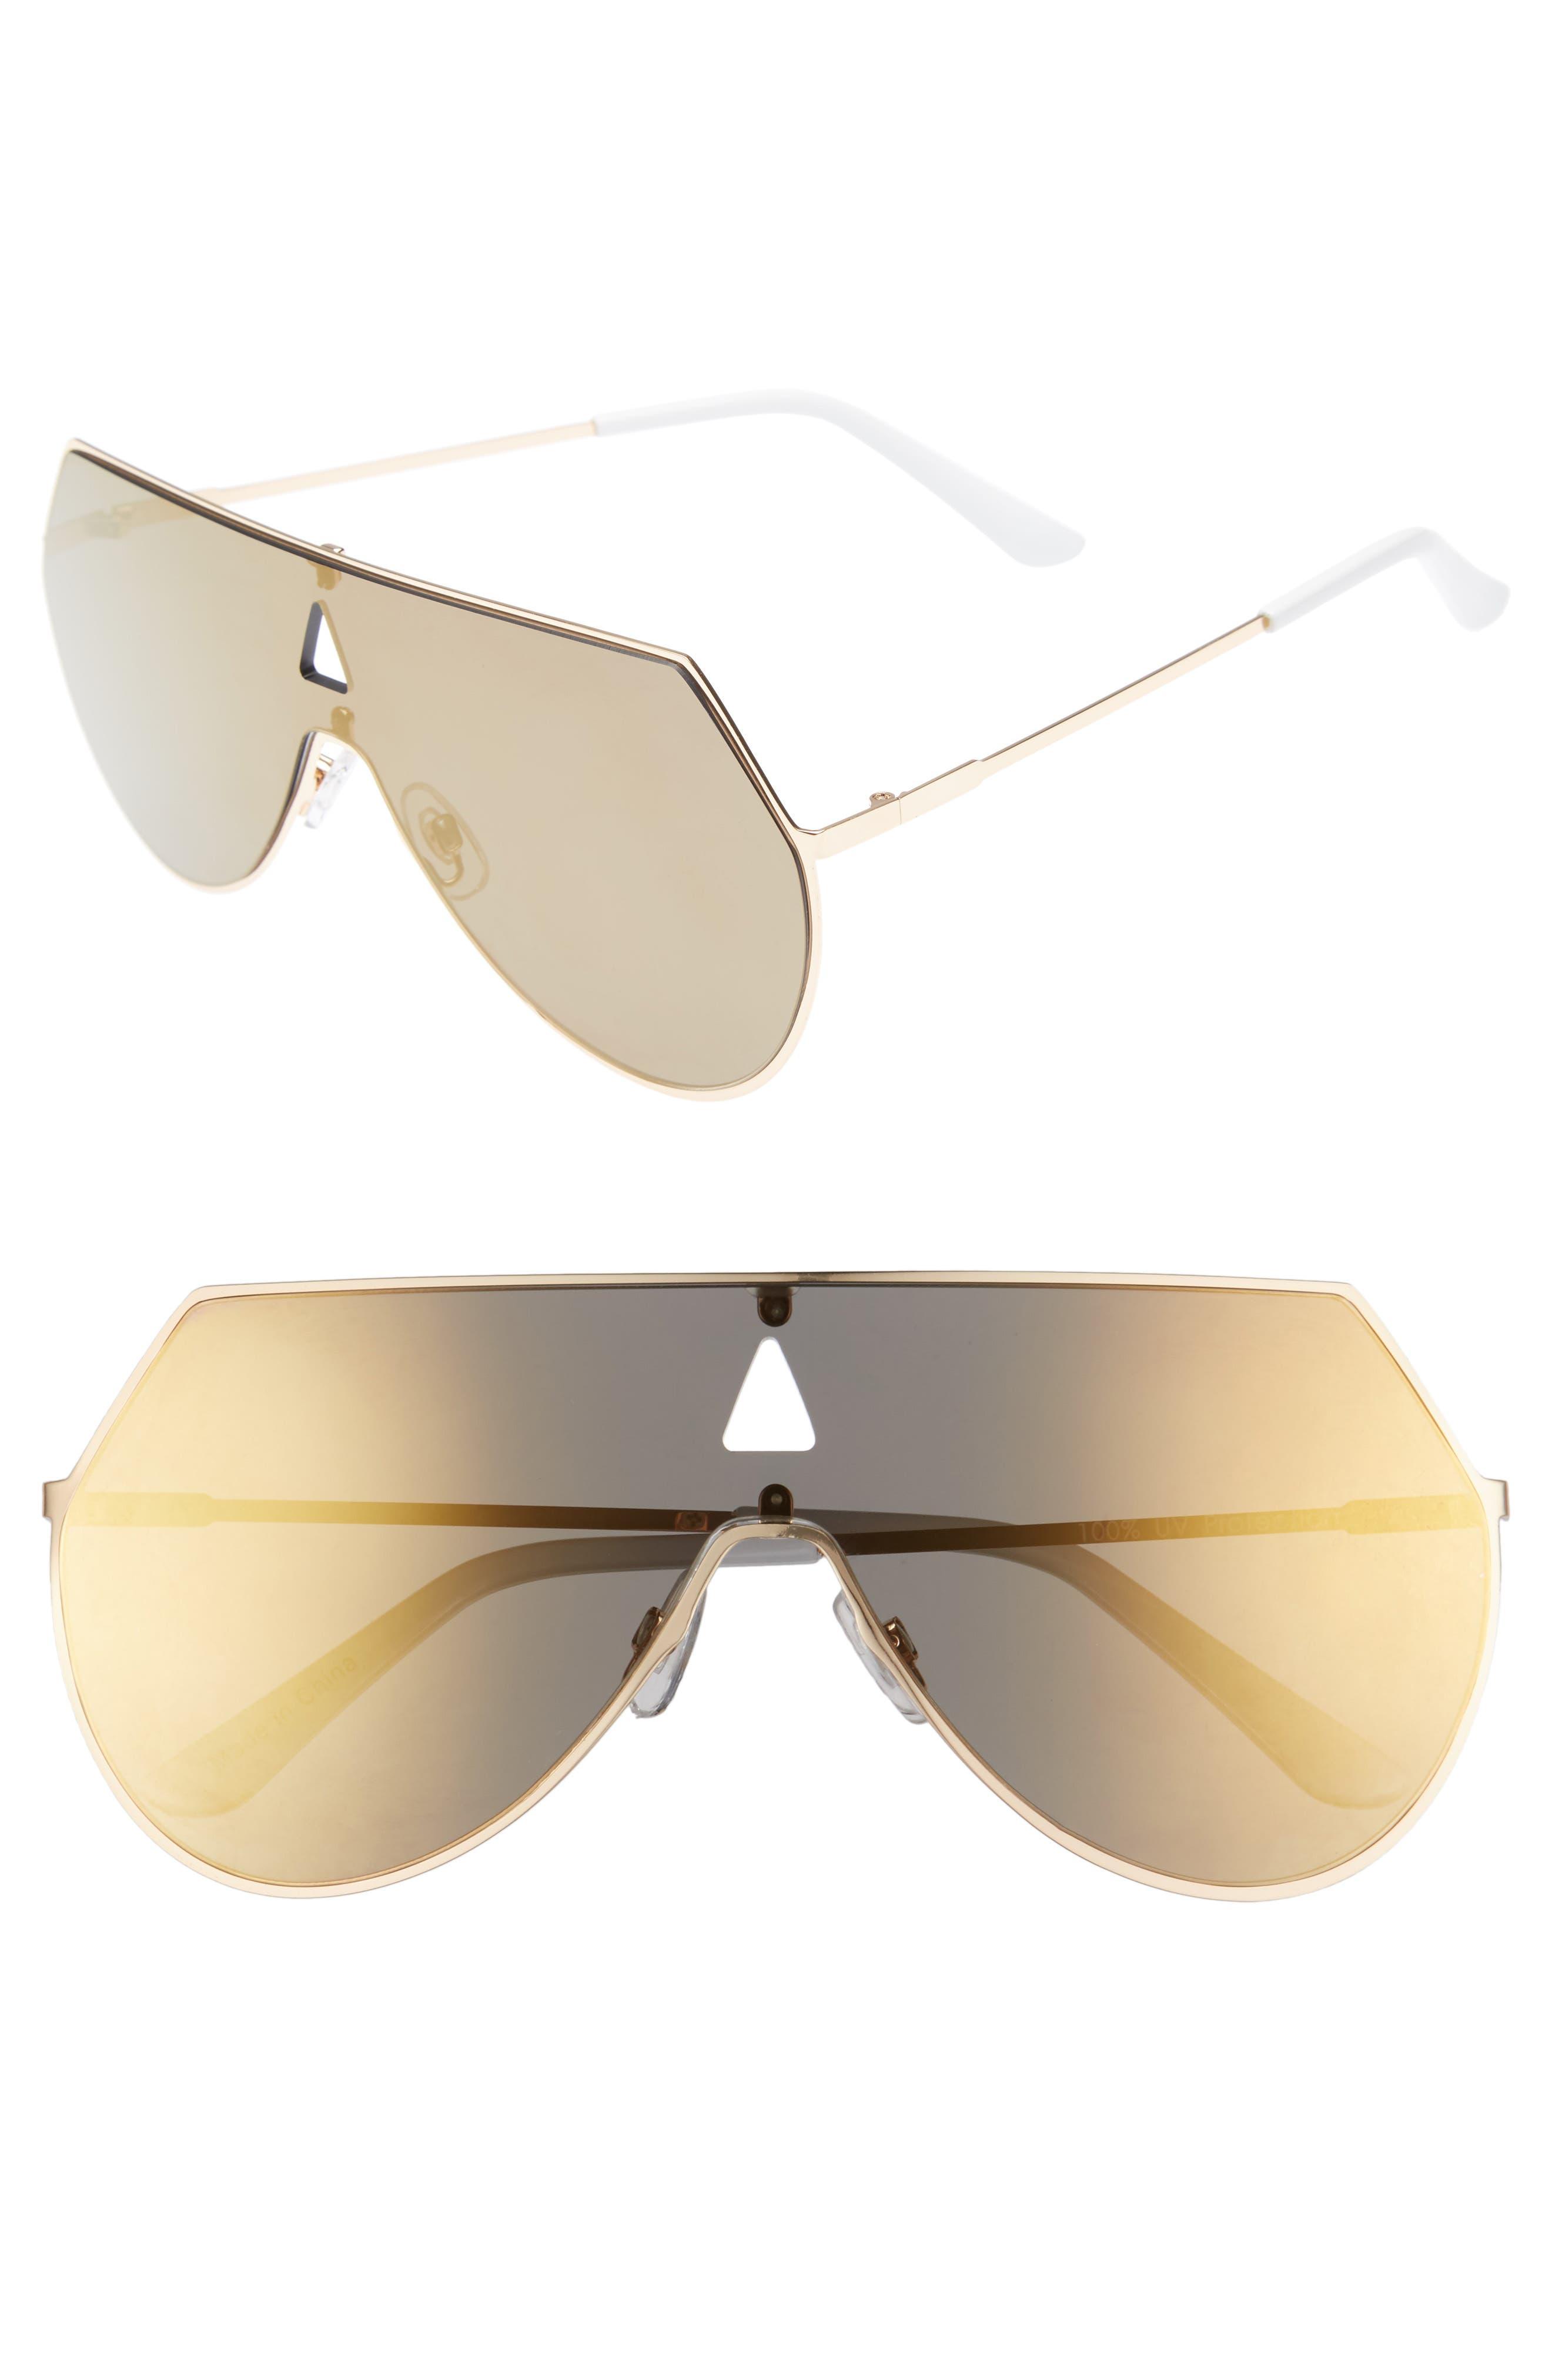 60mm Flat Lens Aviator Sunglasses,                             Main thumbnail 1, color,